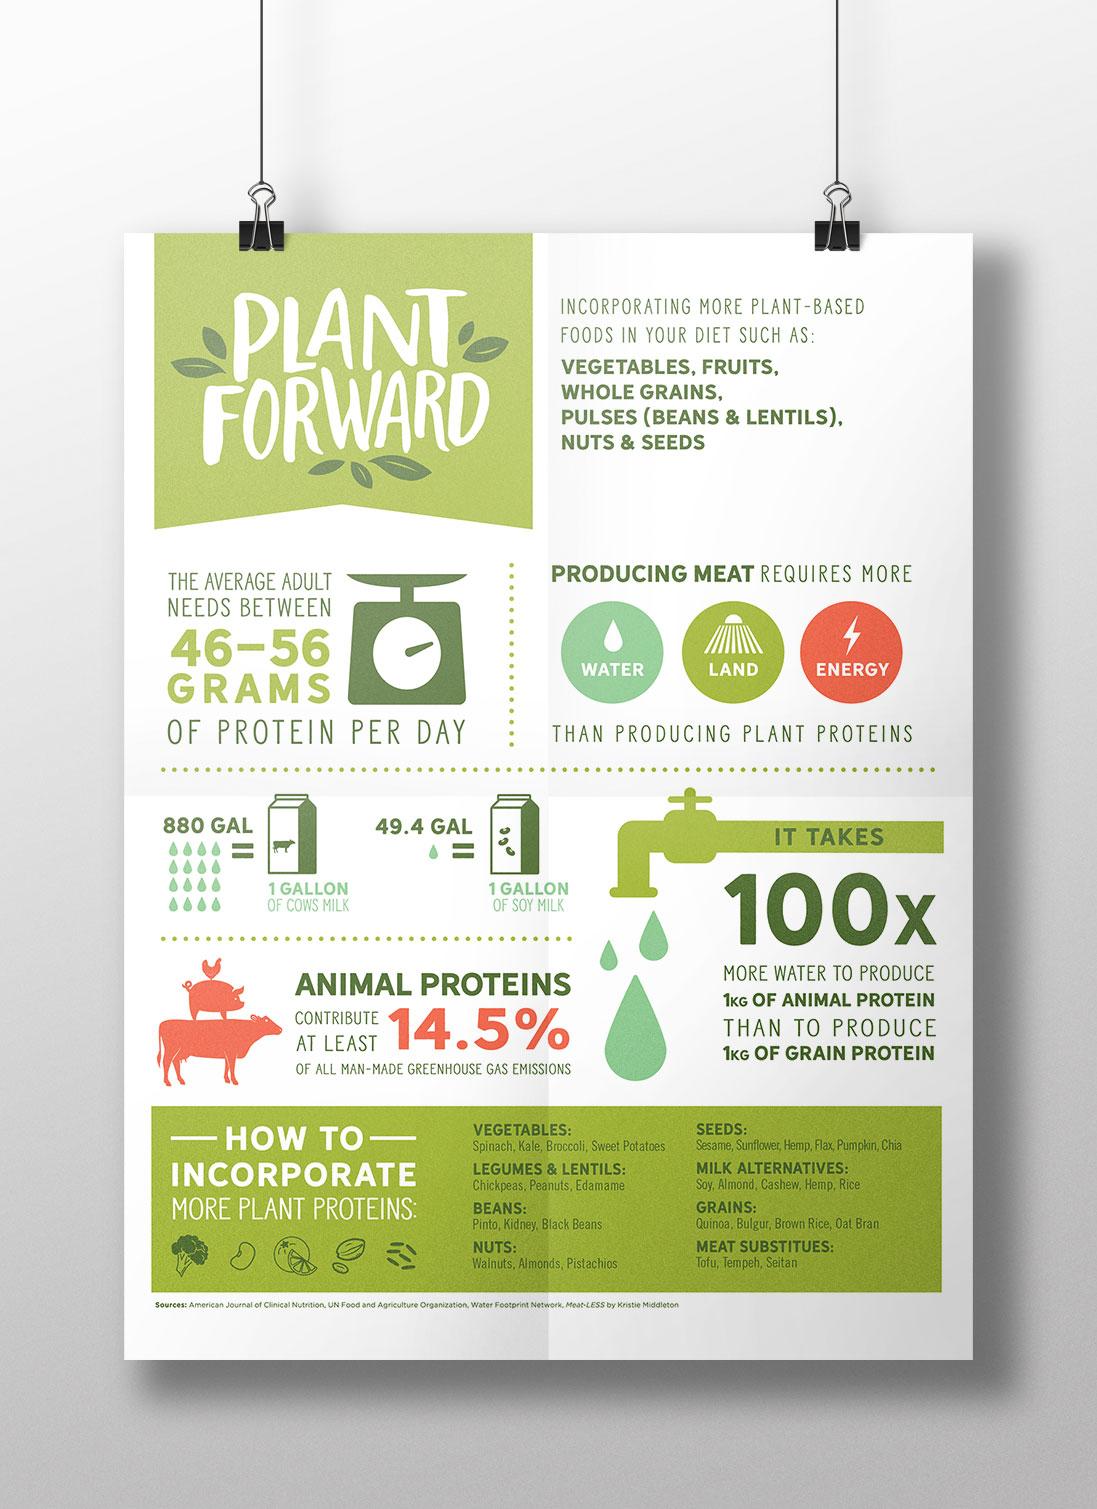 Aramark_Plant-Powered-Campaign_Infographic.jpg